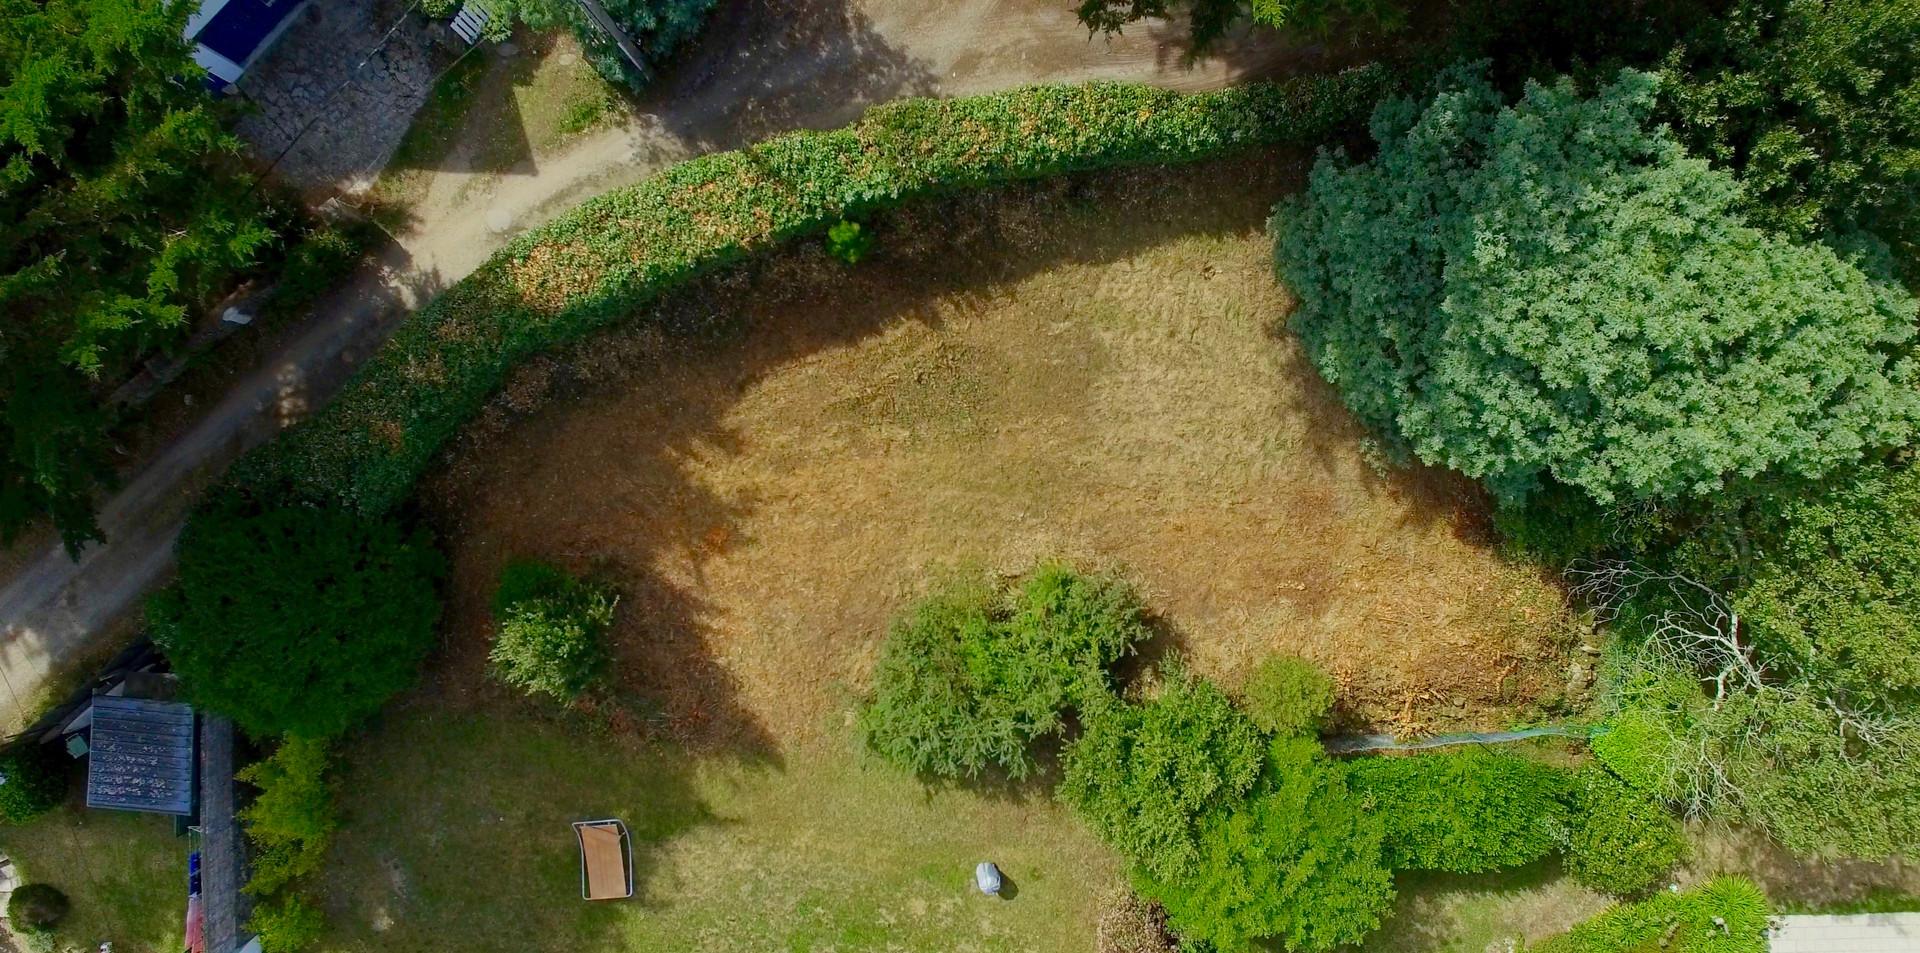 FlyUp Drone-Carnac-Pointe St Colomban-11